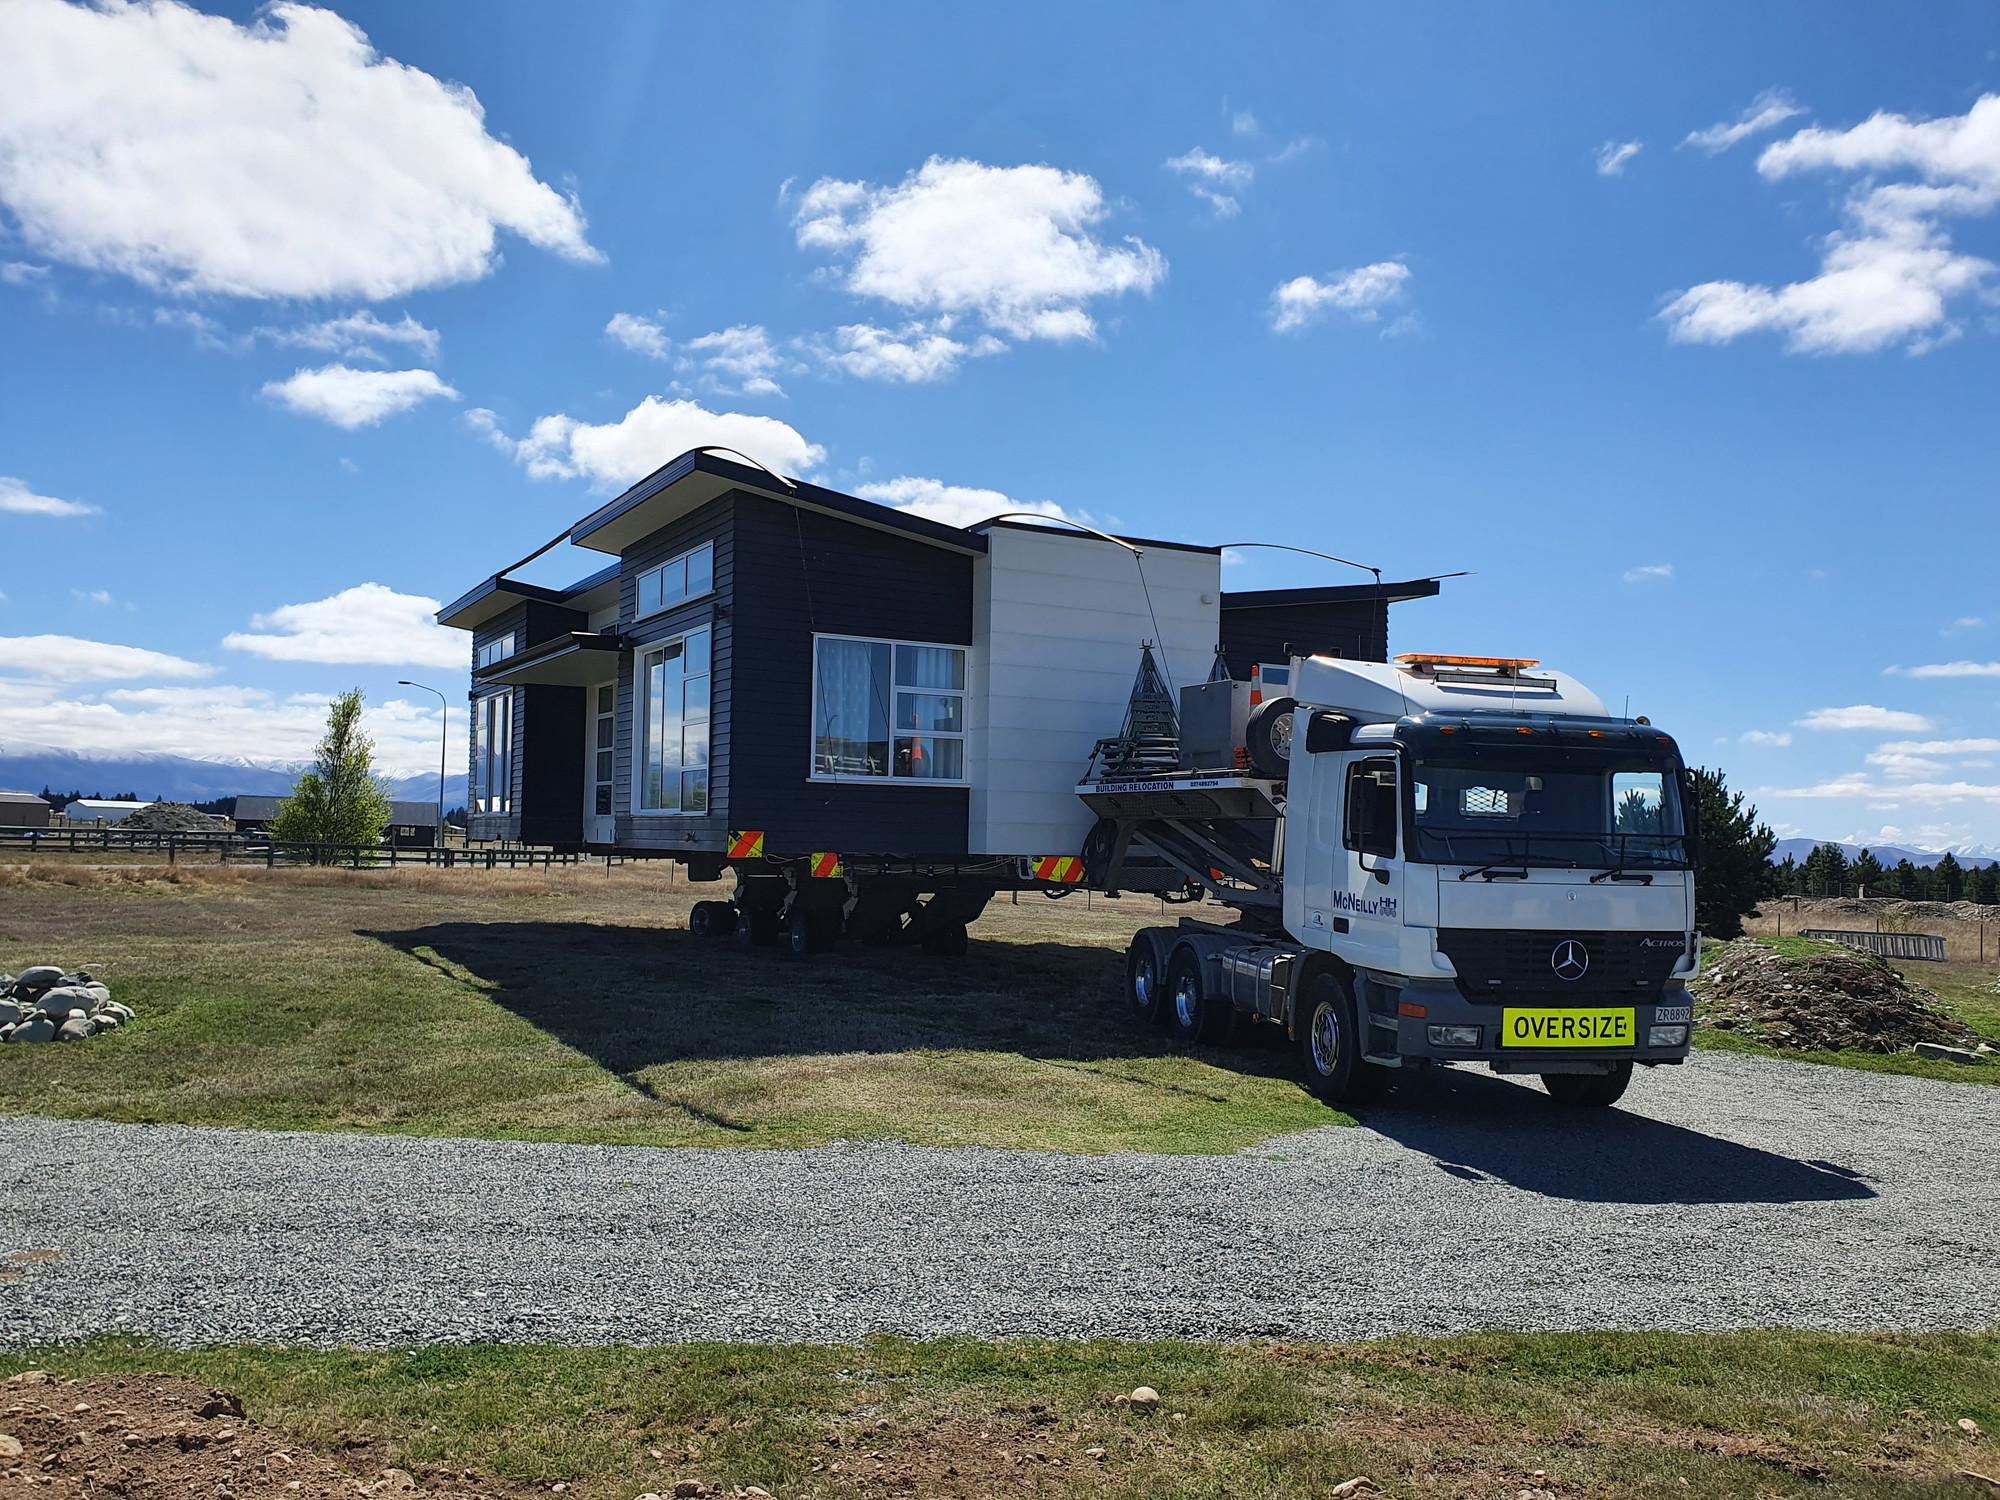 McRaeway Show Home arriving on site